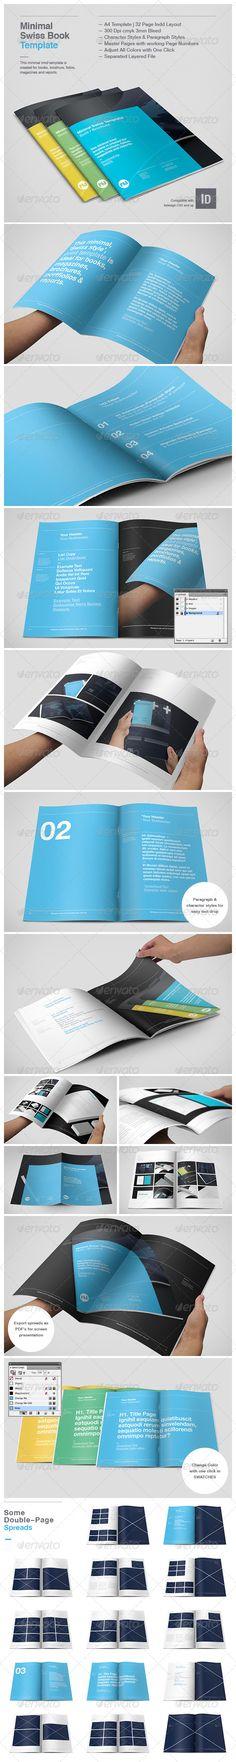 Minimal Swiss Print Template - GraphicRiver Item for Sale